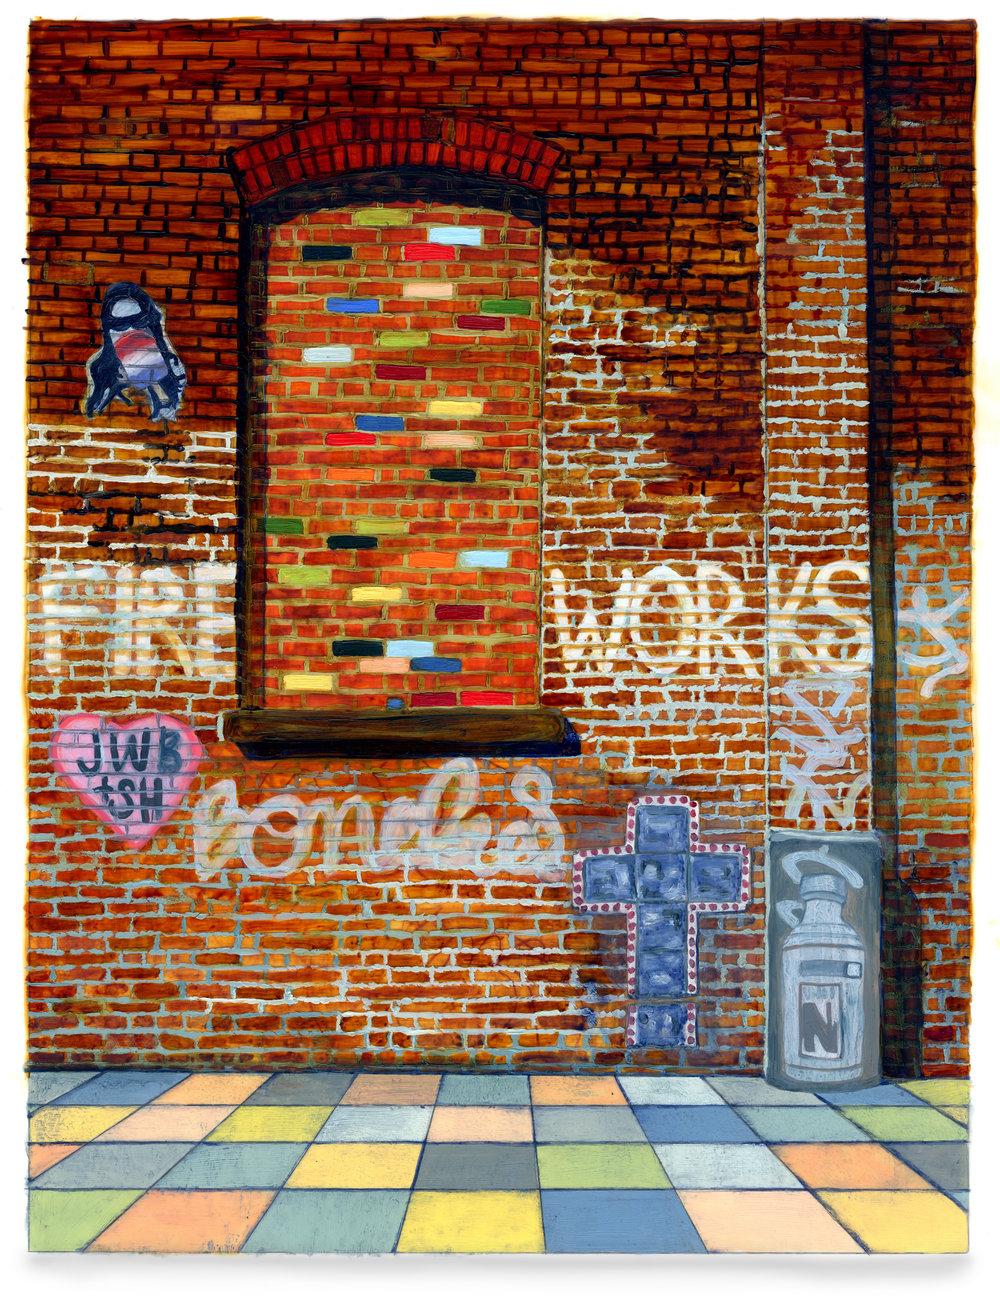 Bricks and Stones May Break (Brooklyn/Fire Works)